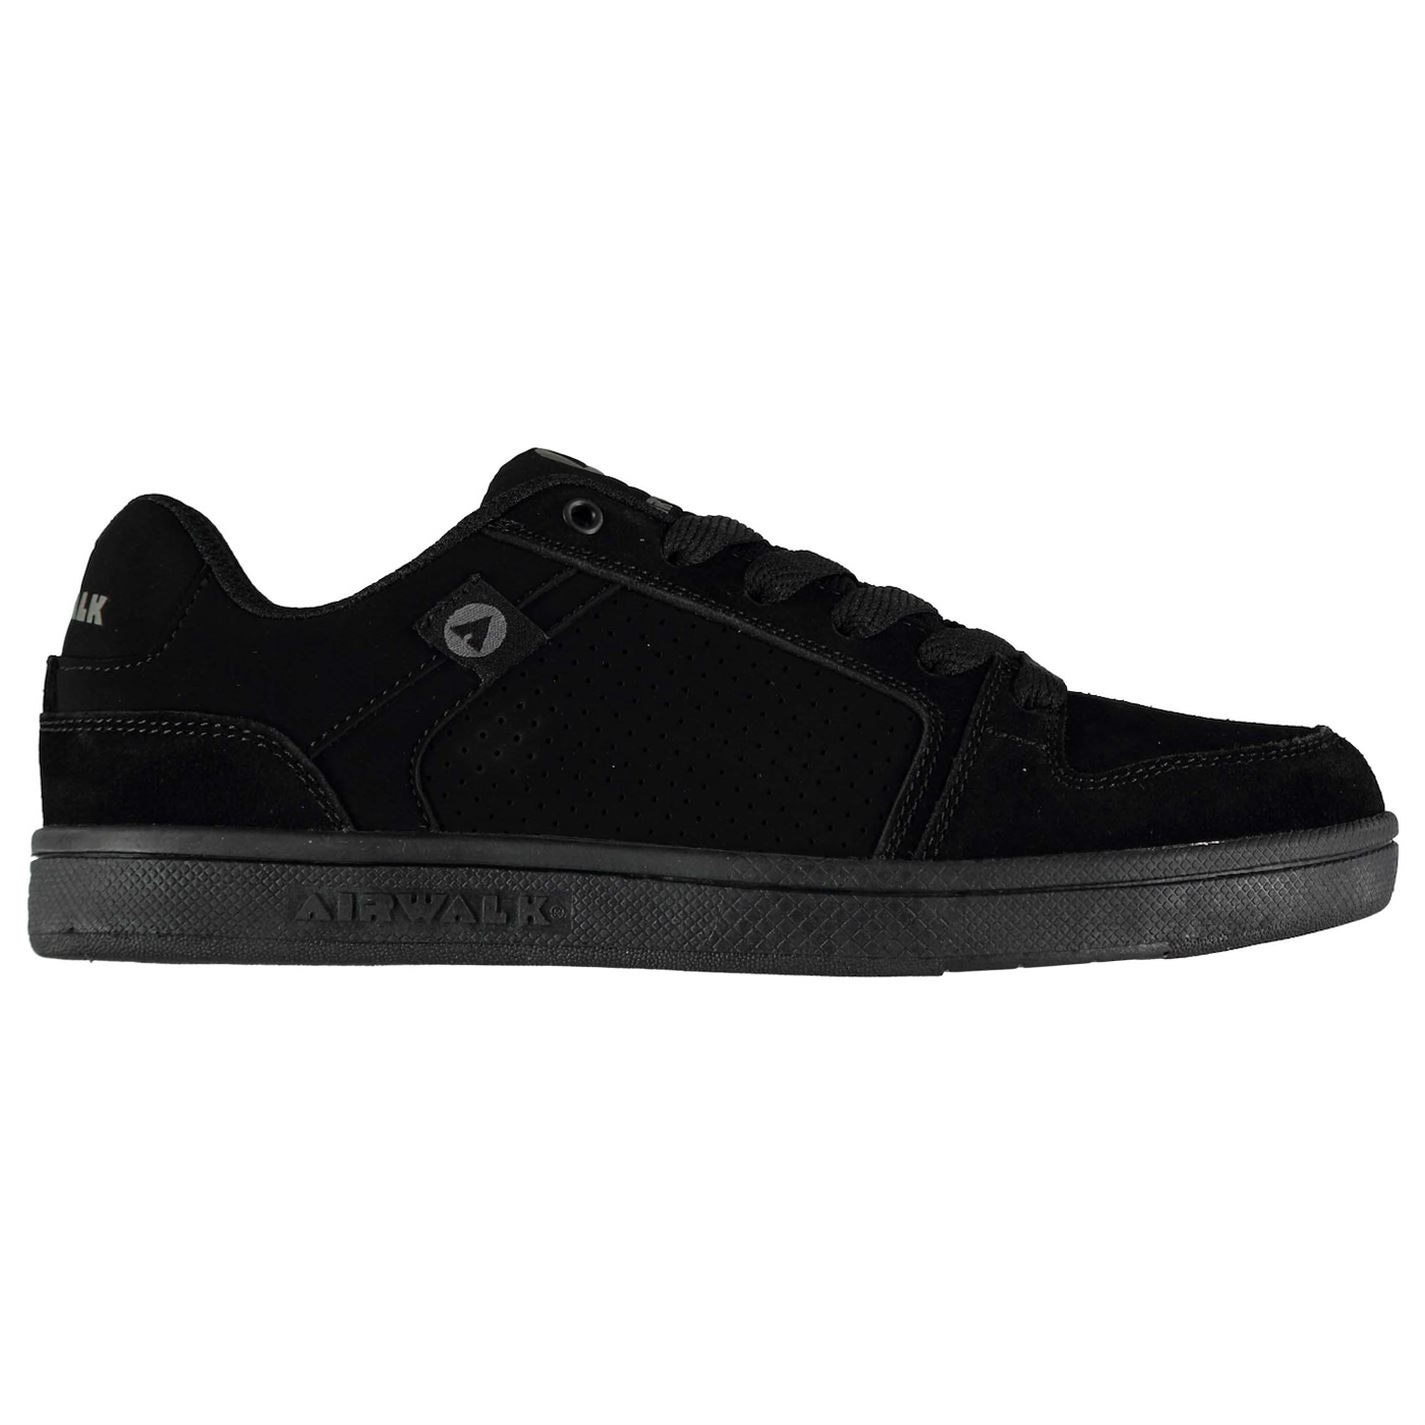 Airwalk Brock dětské Skate Shoes